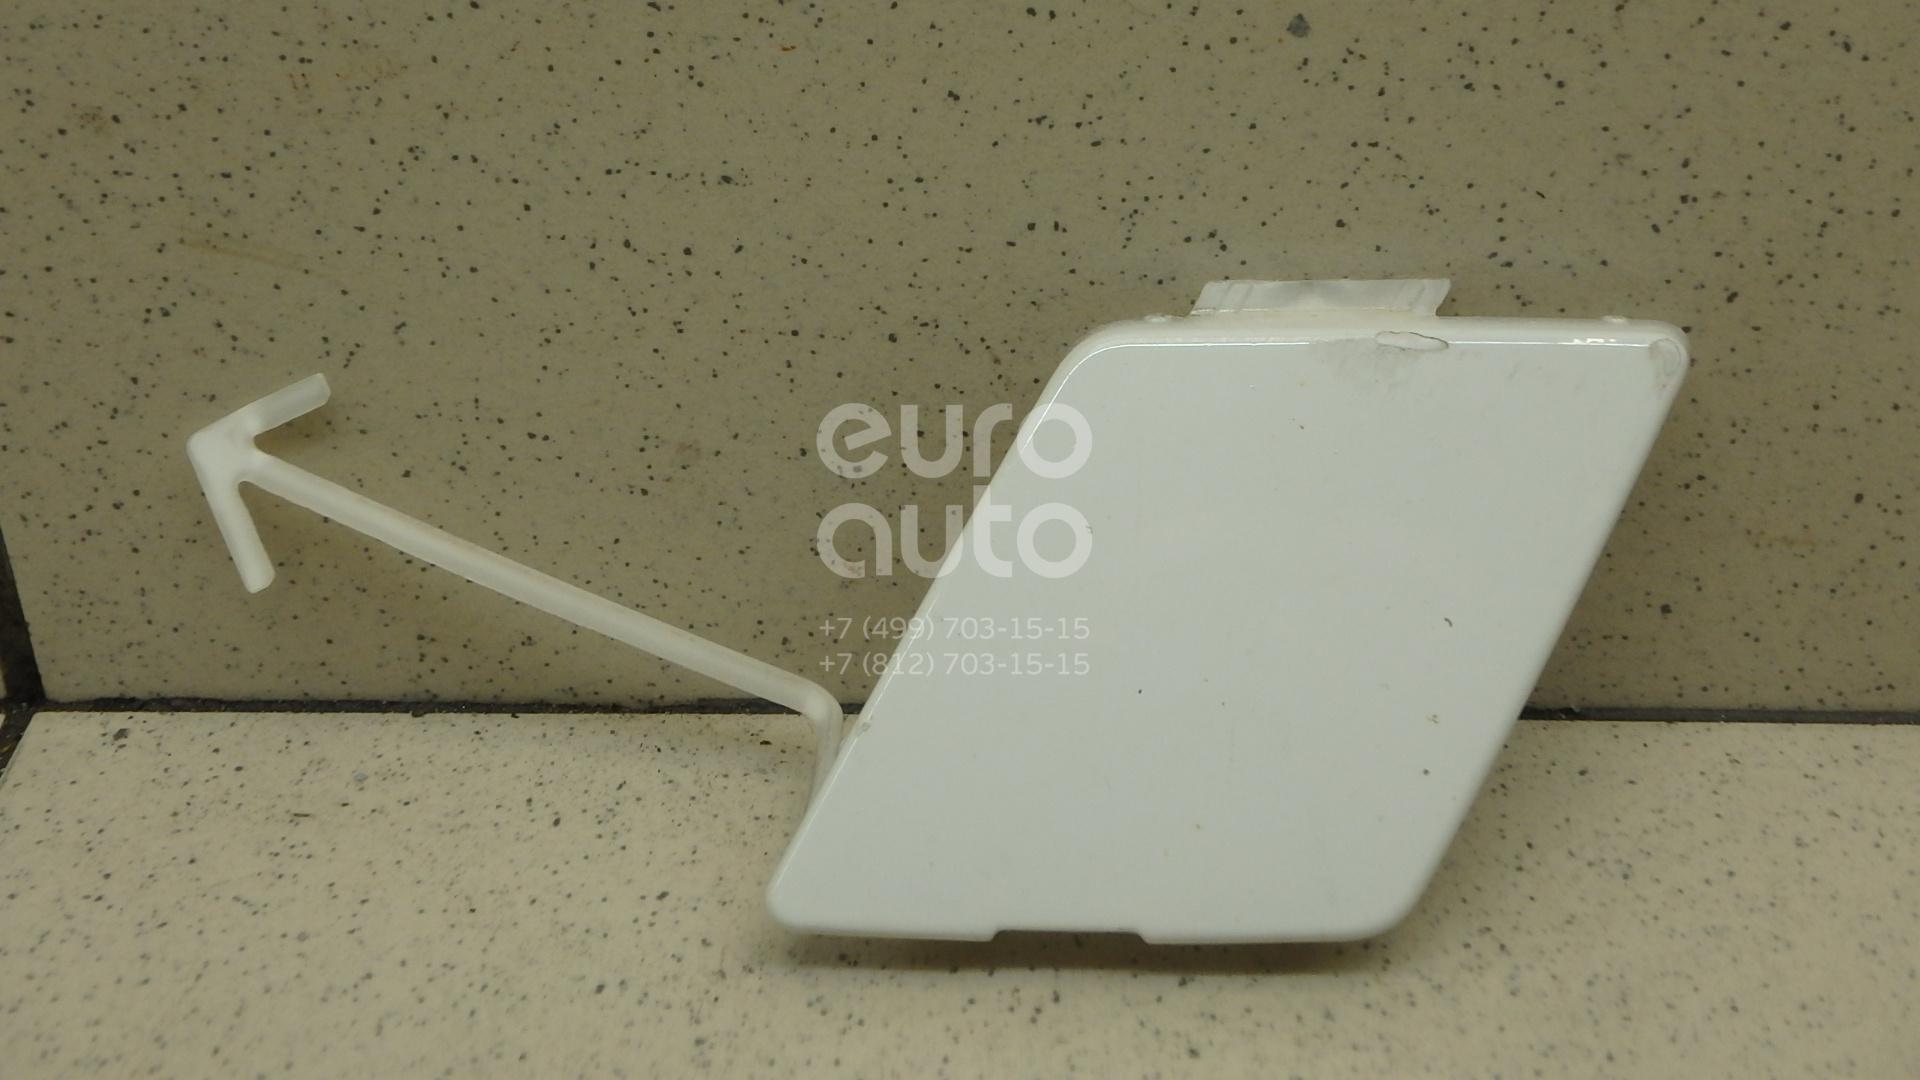 Купить Заглушка буксировочного крюка VW Tiguan 2007-2011; (5N0807241GRU)